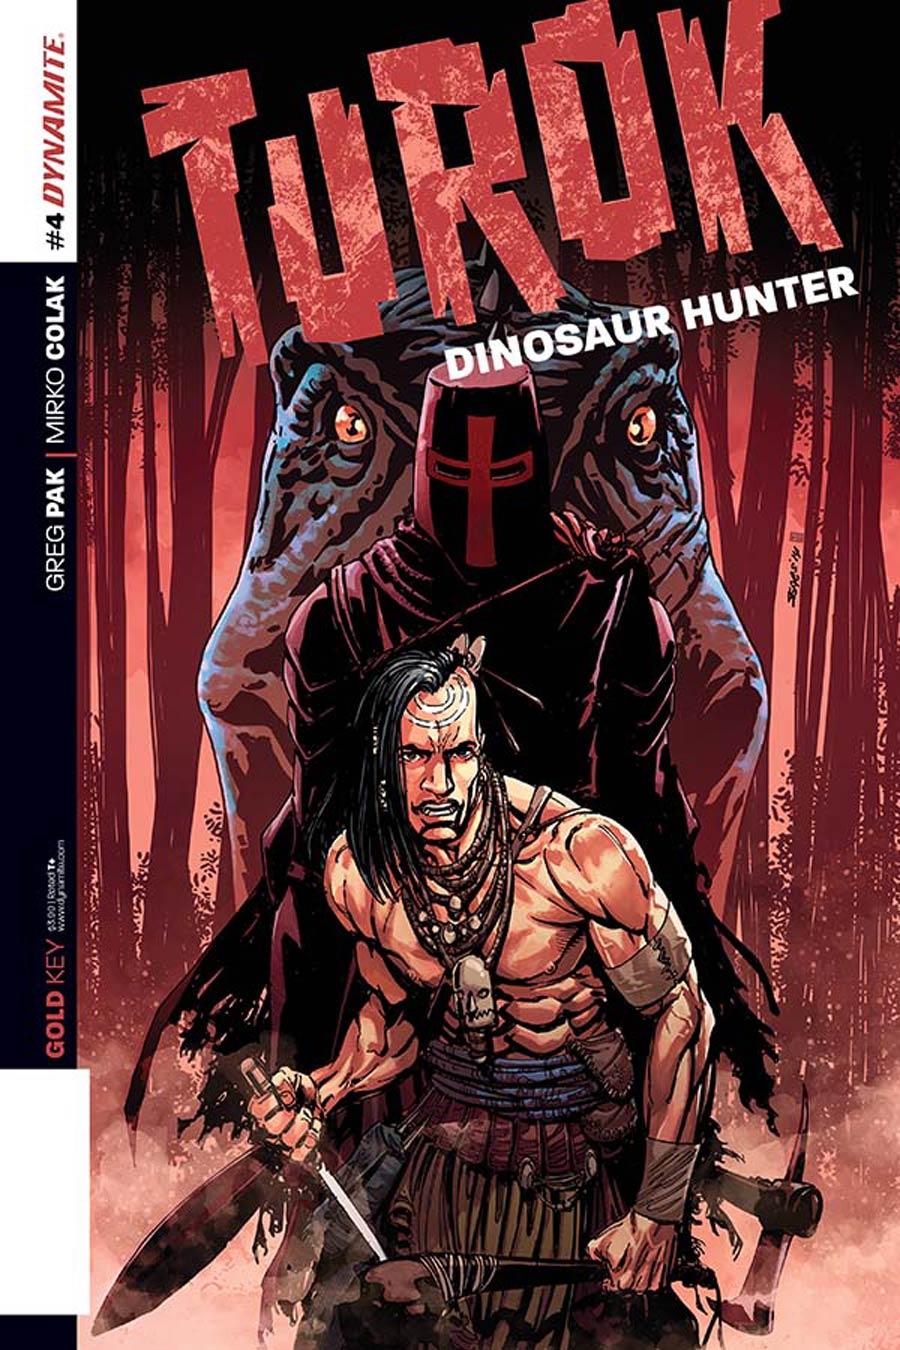 Turok Dinosaur Hunter Vol 2 #4 Cover A Regular Bart Sears Cover